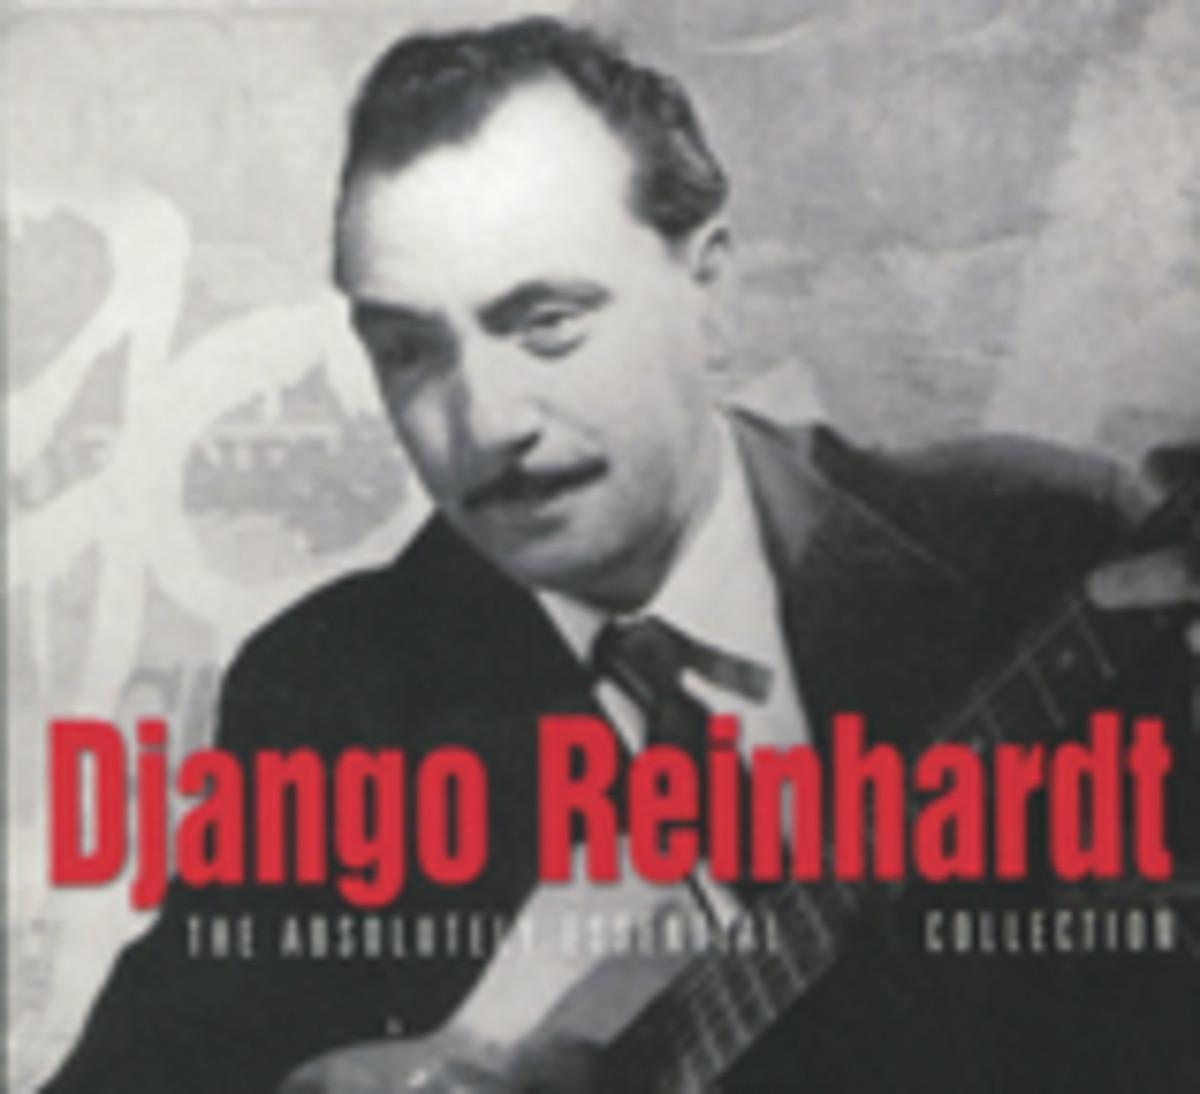 DjangoReinhardt_Essential